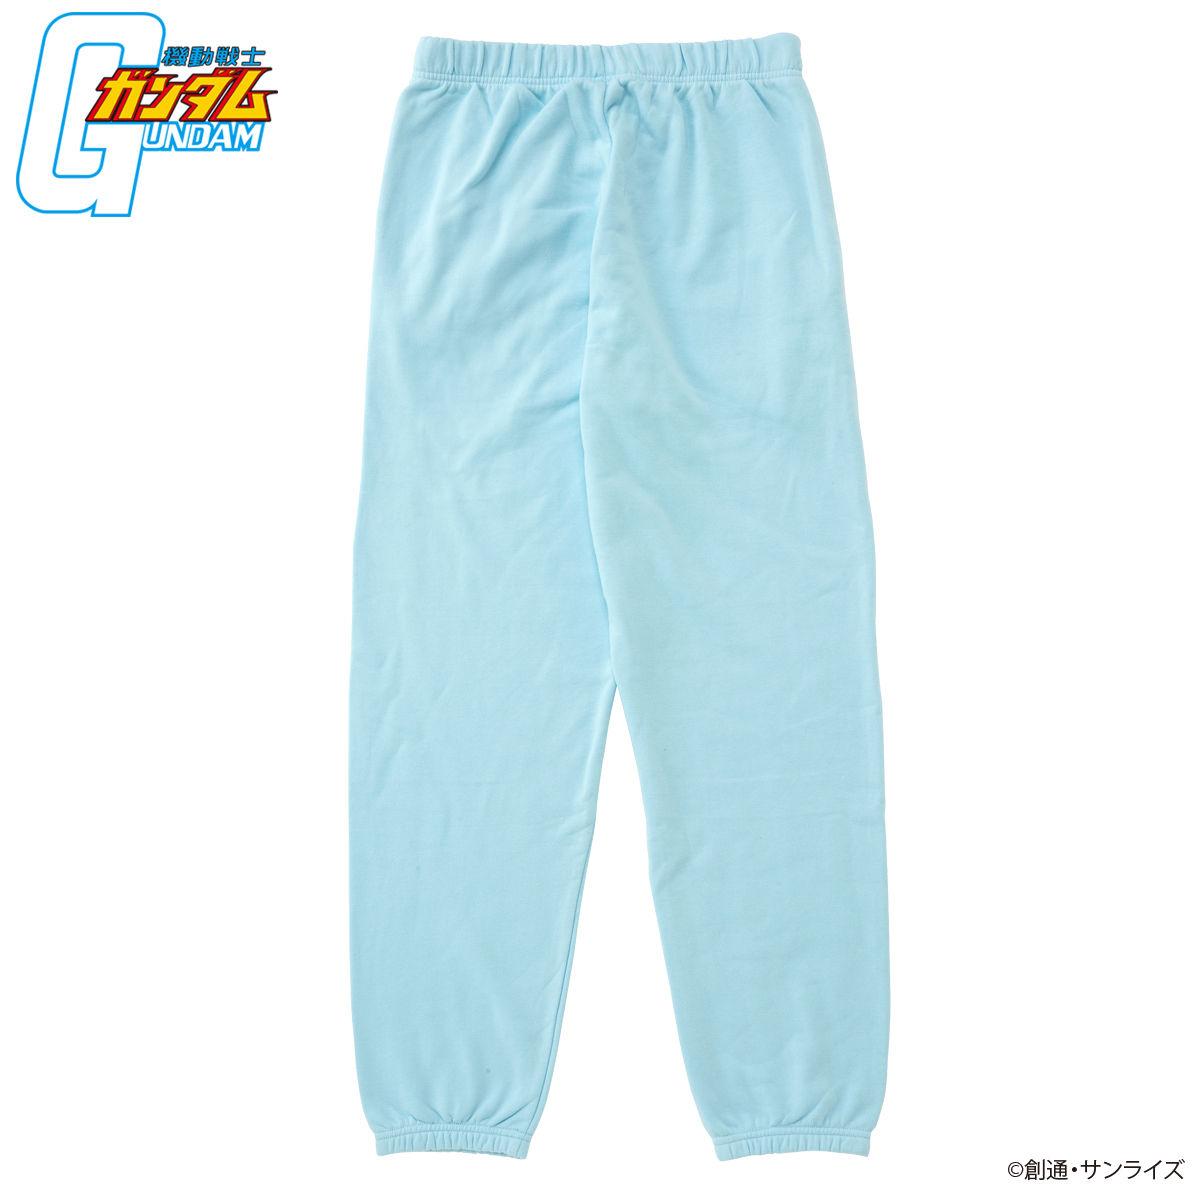 Mobile Suit Gundam Operation V Workout Pants